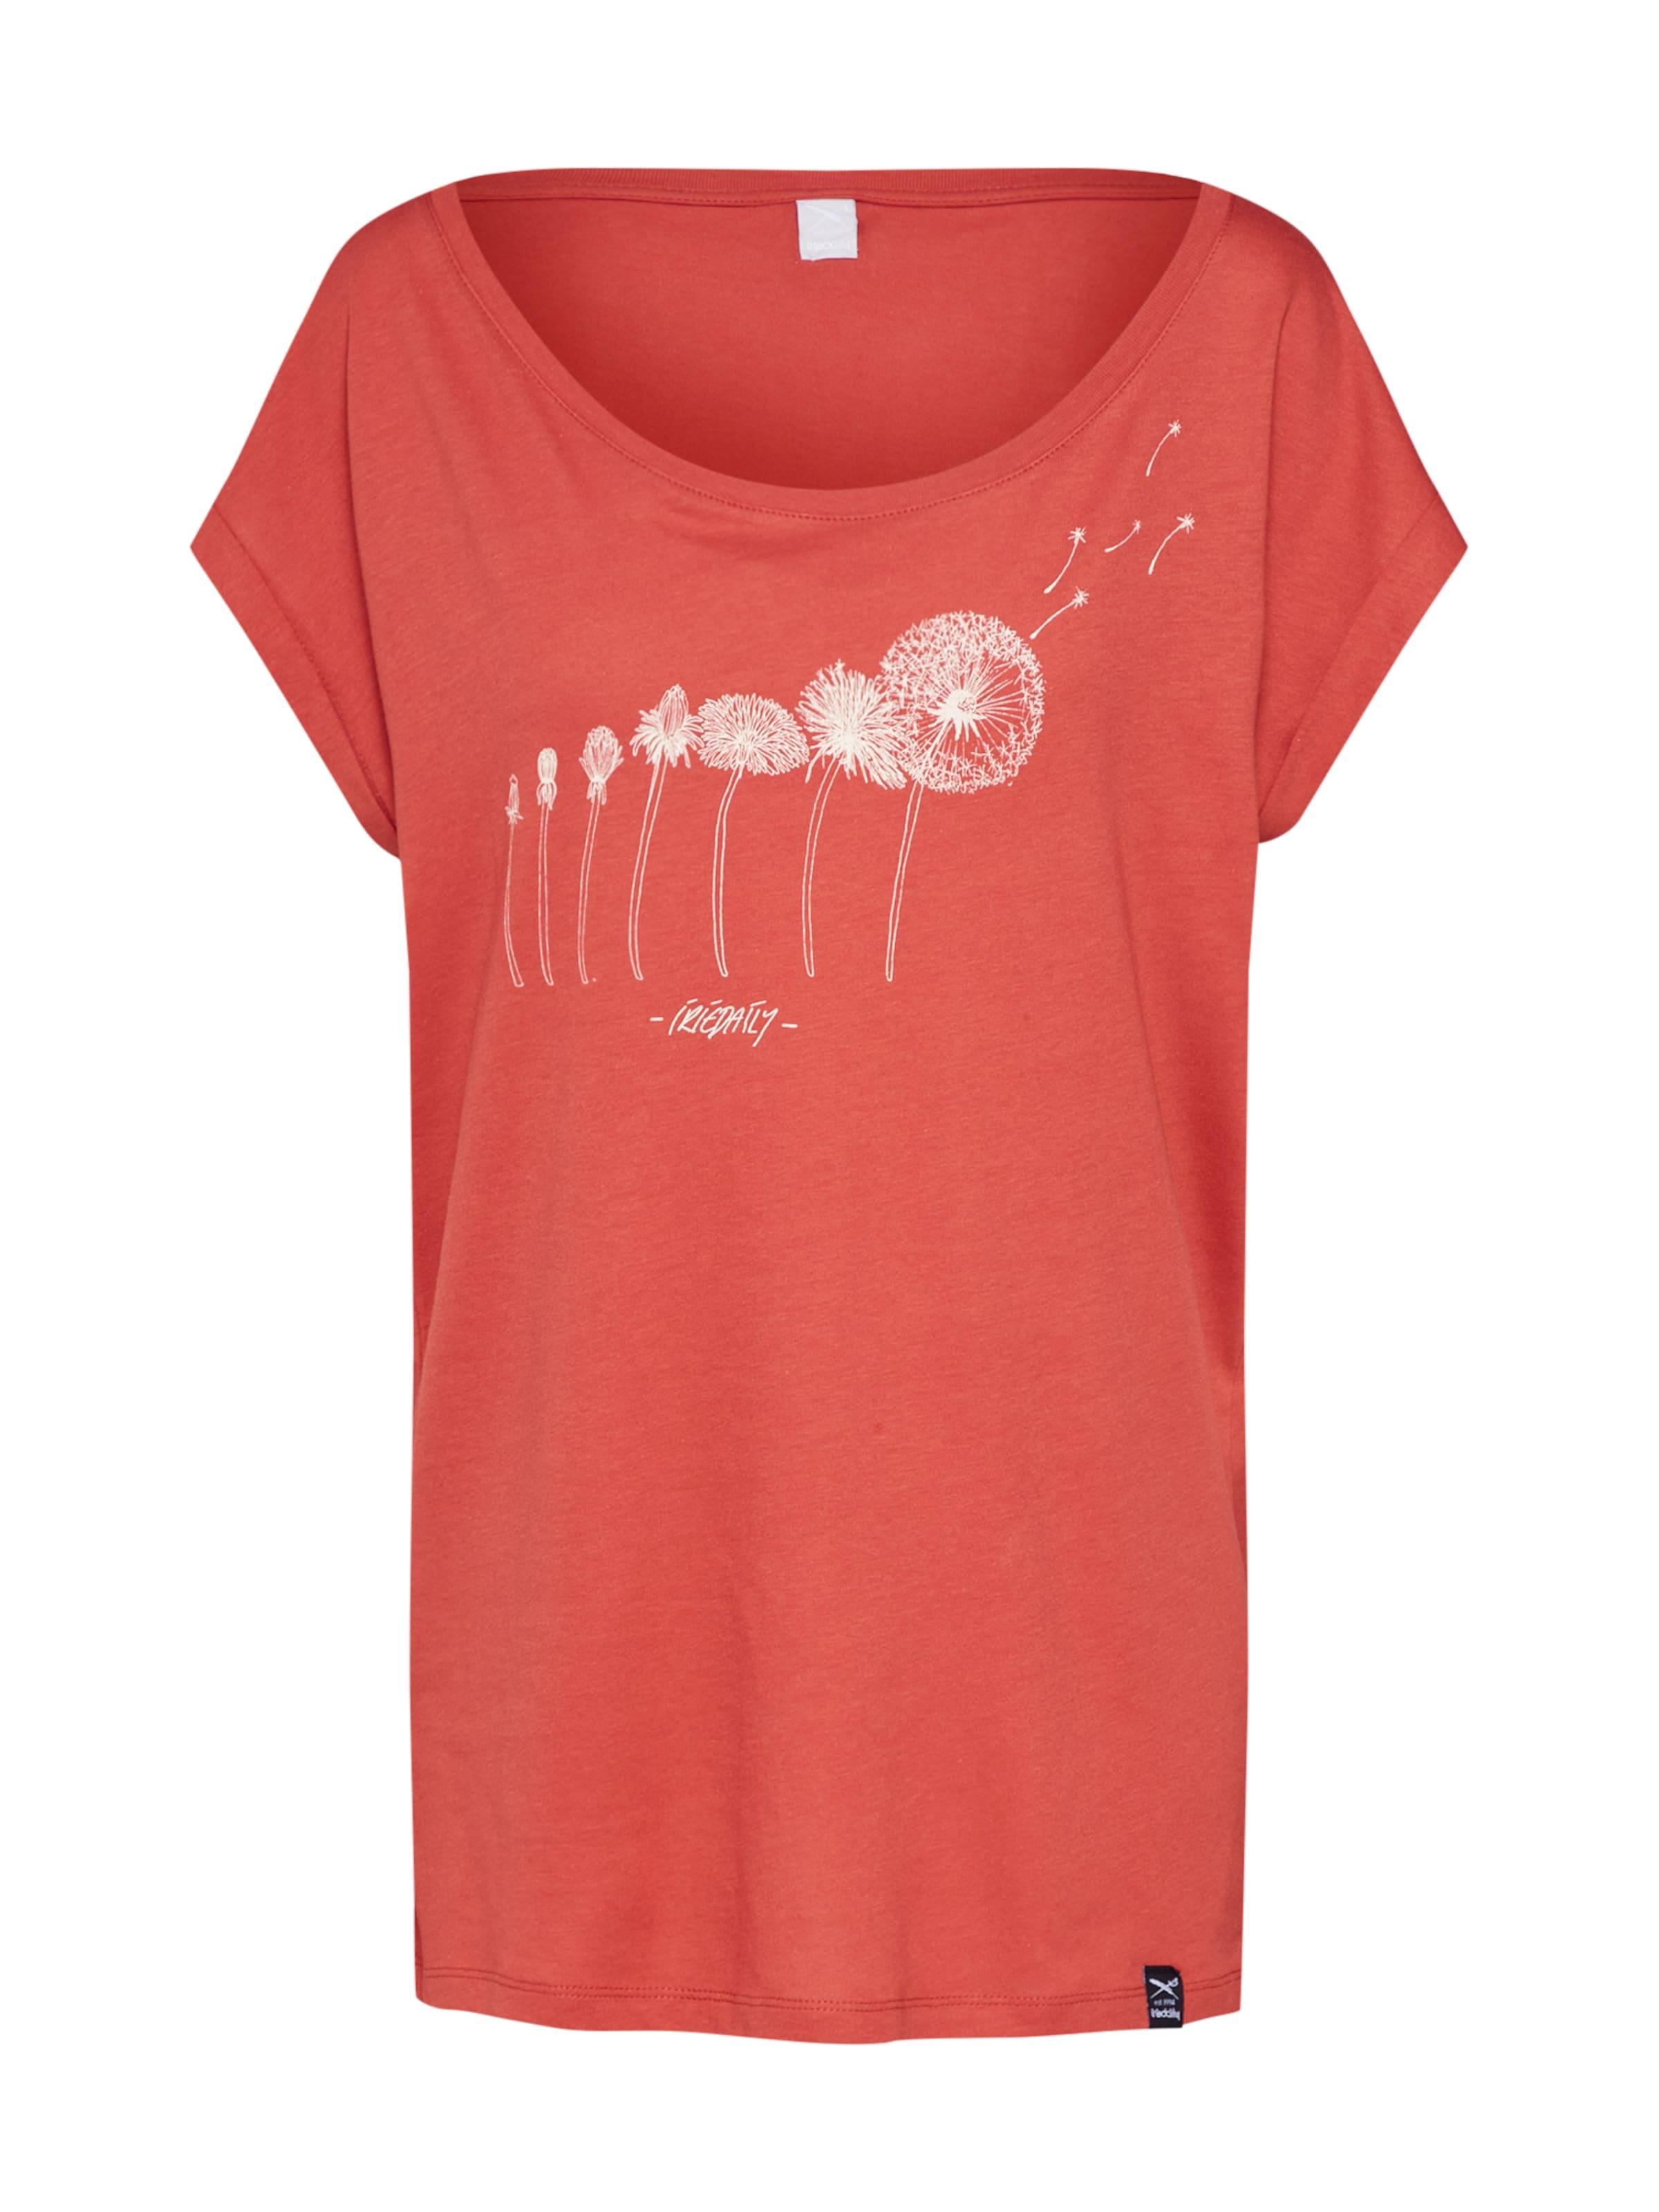 T 'evolution' Iriedaily Orangerot In shirt Nnv0wm8O